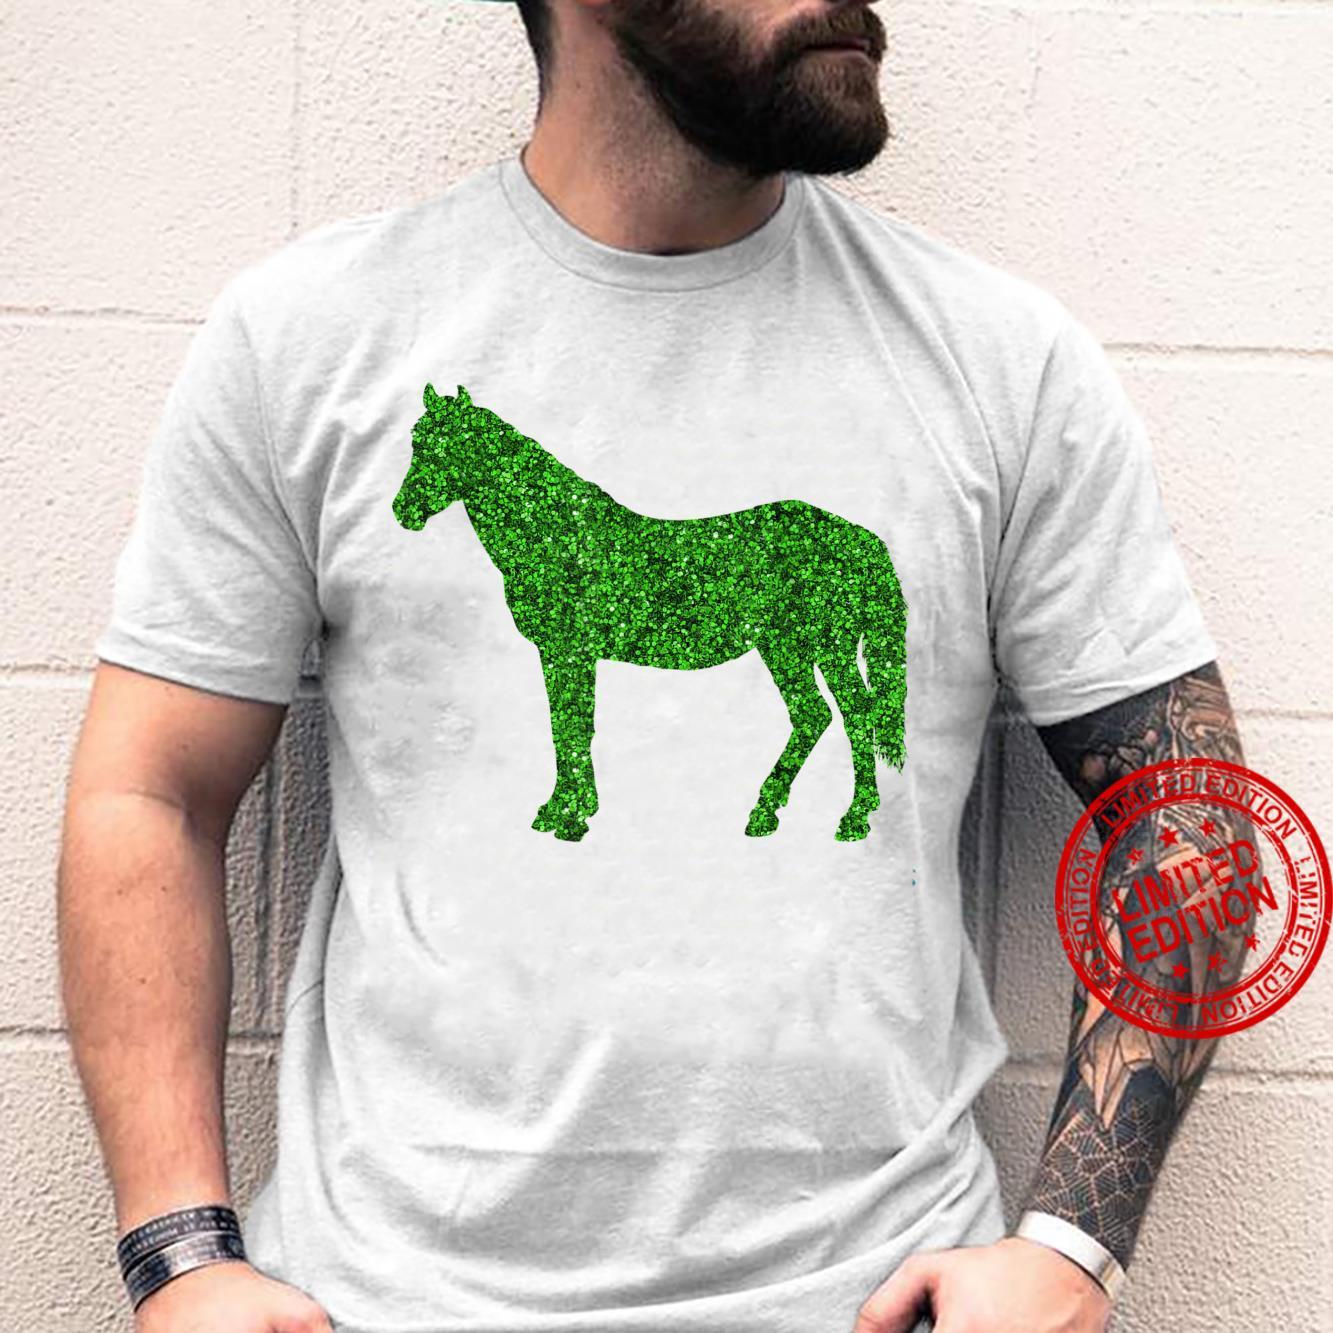 Horse riding Green Horse Riding Shirt